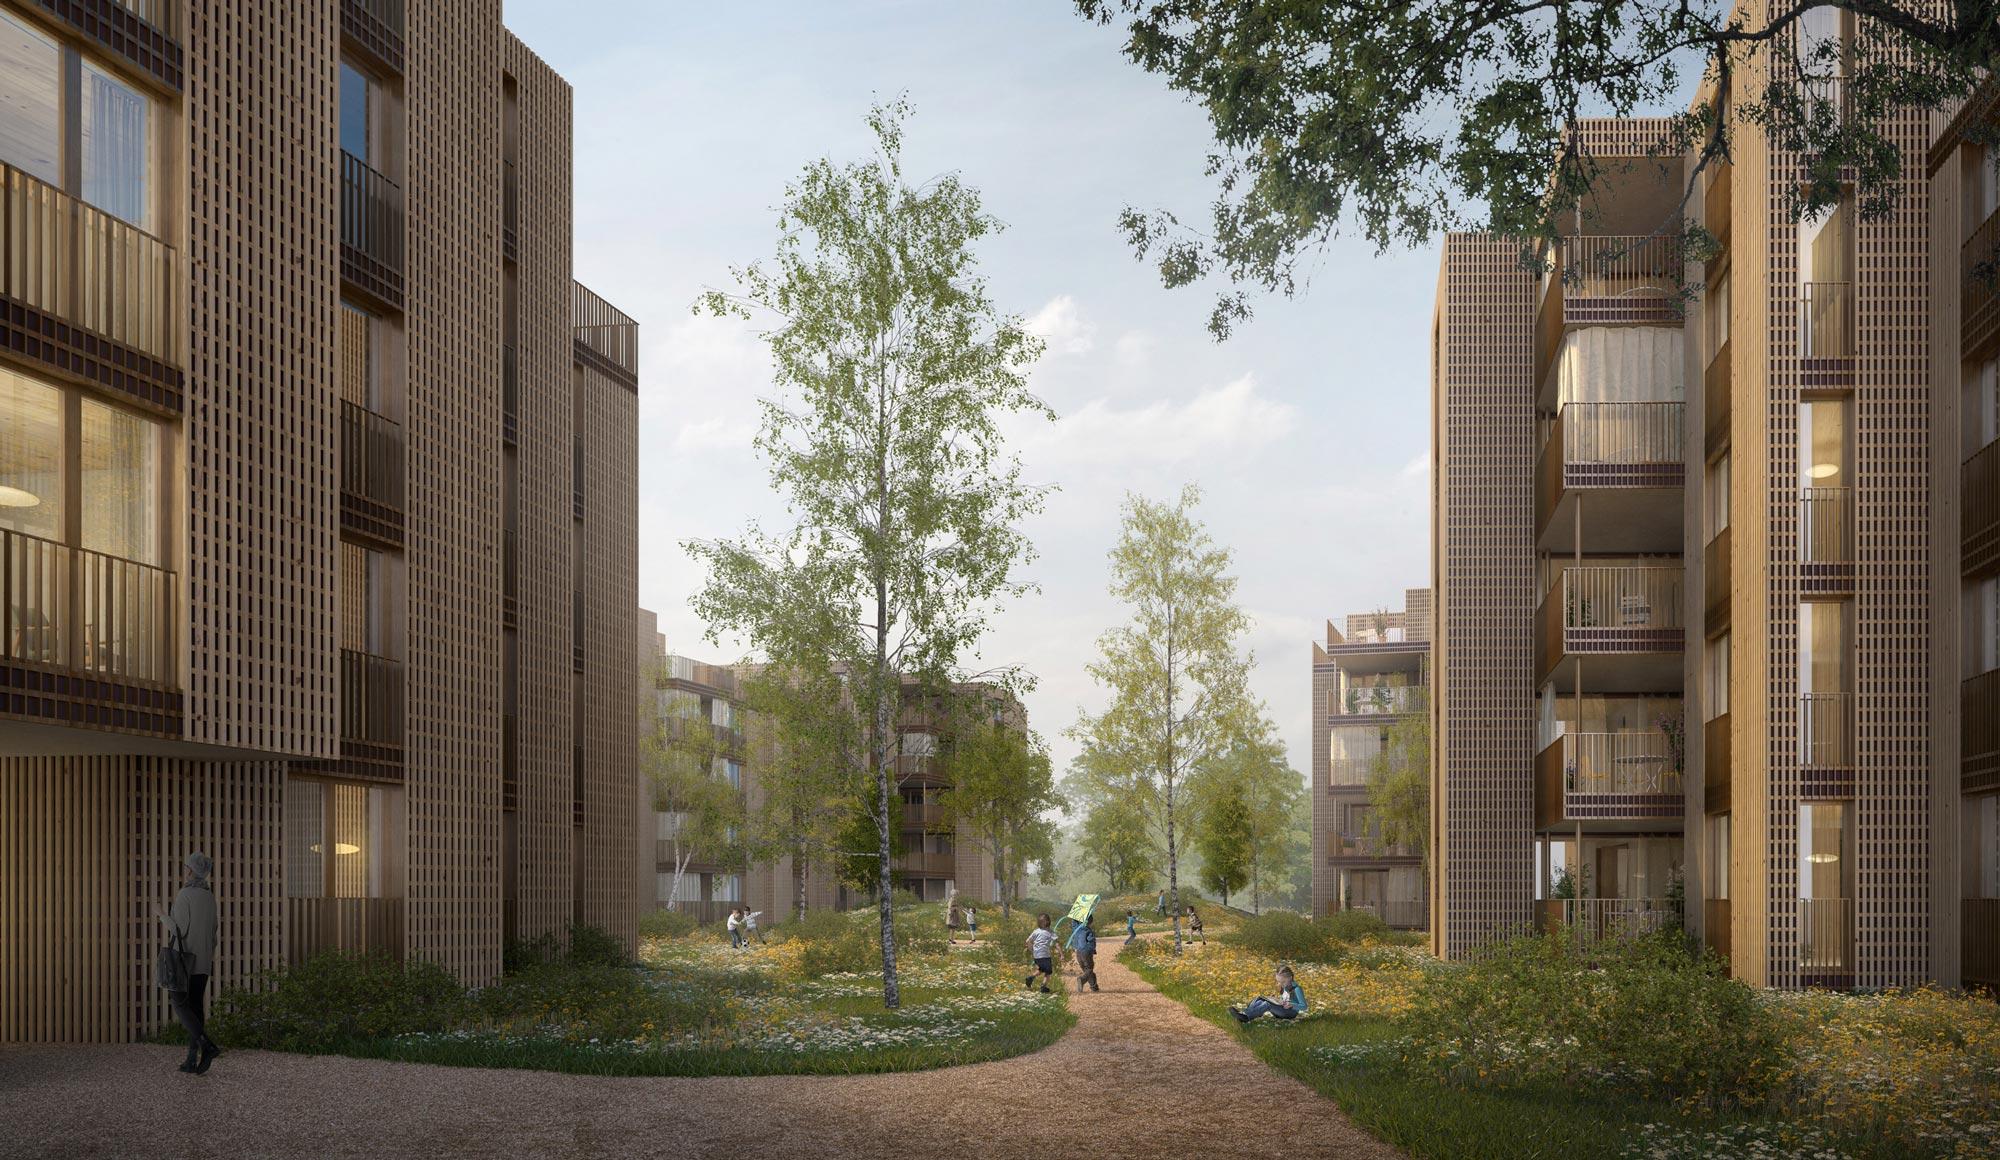 ahaa GmbH | social housing in Switzerland